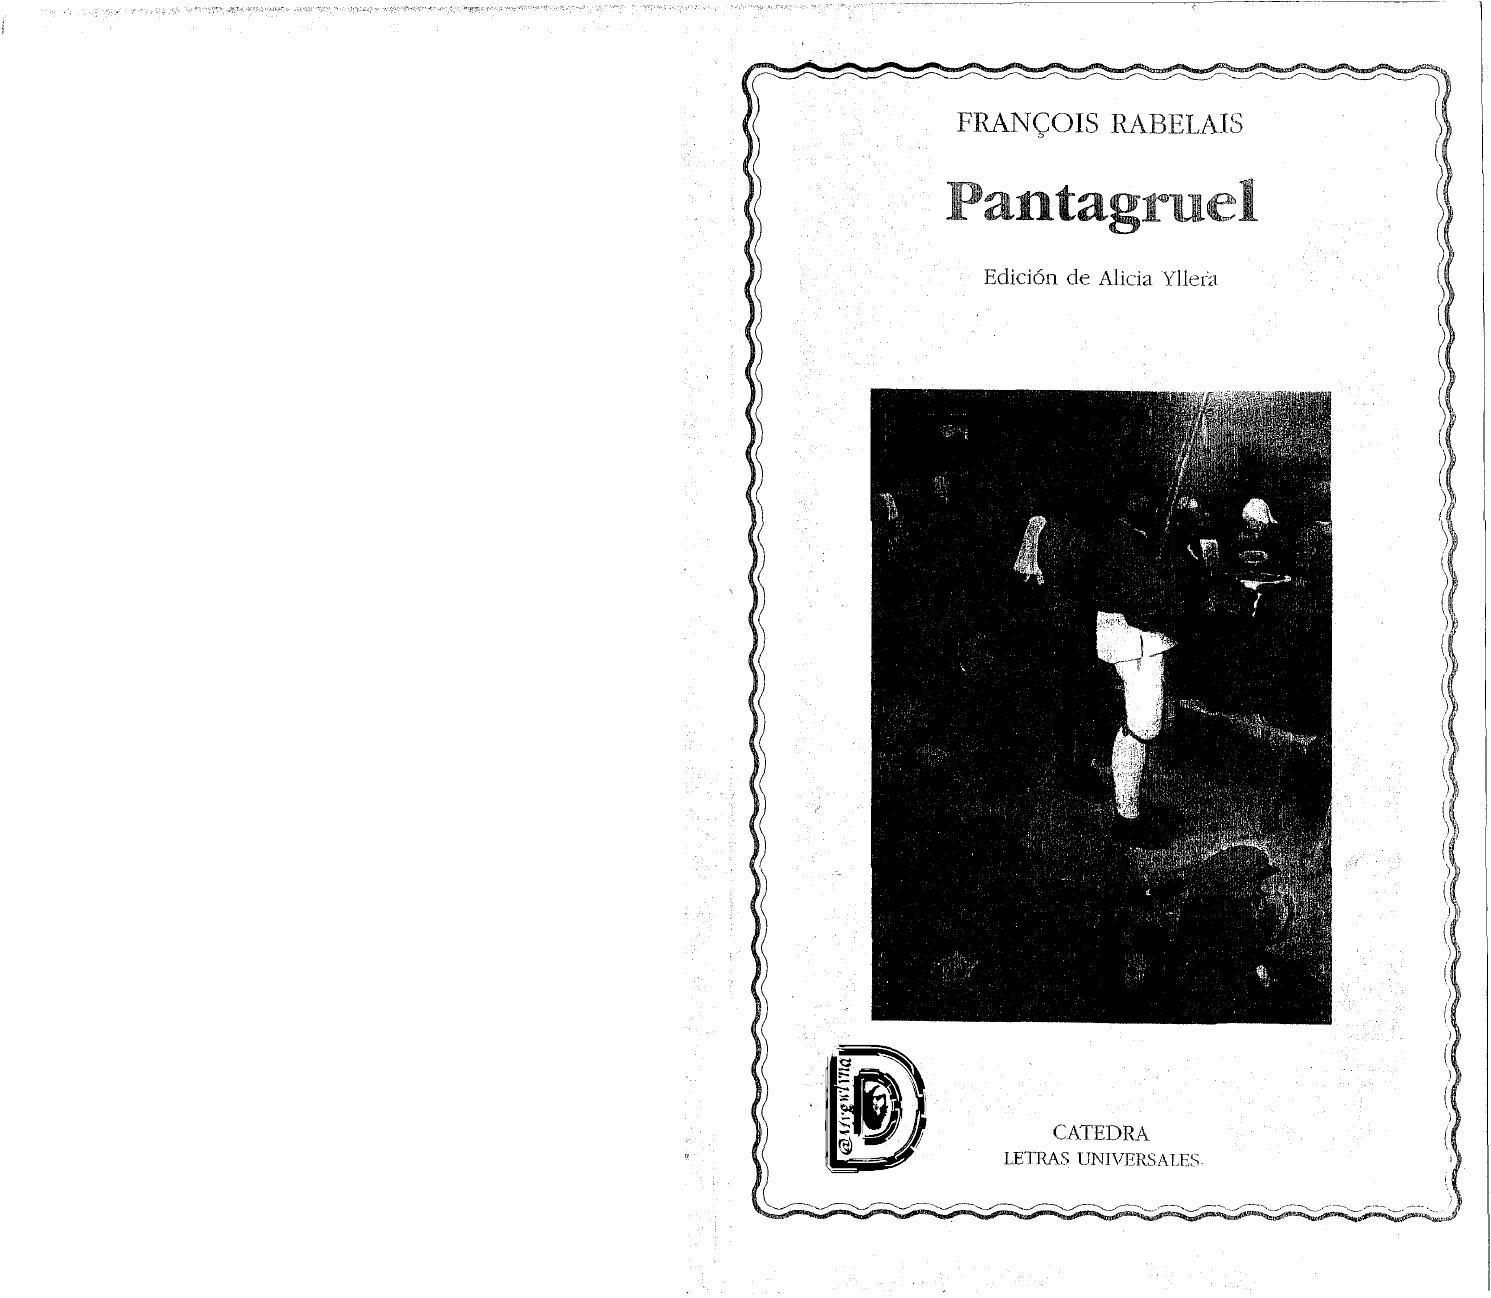 Issuu Dm PantagruelcatedraBy Rabelais Francois Lmygwlyna Fc1KJ3Tl